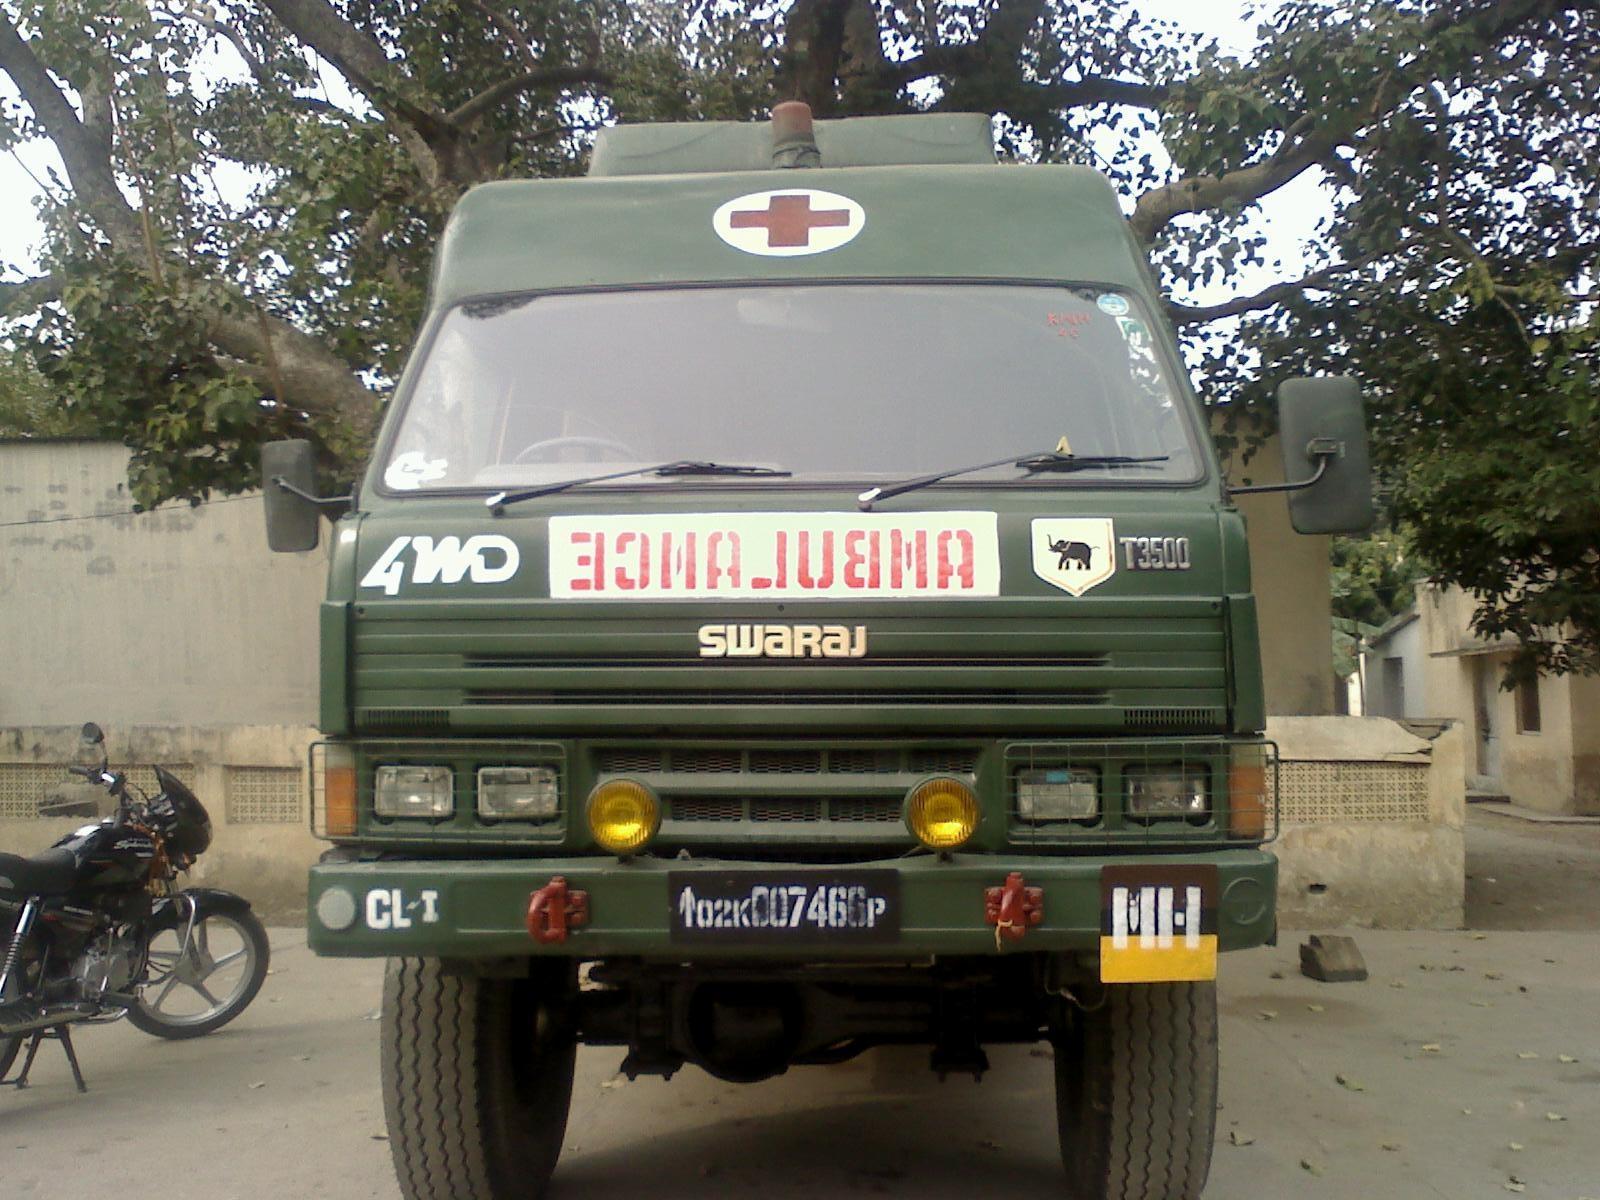 SWARAJ Swaraj Mazda And Punjab Tractors Limited Indias Original